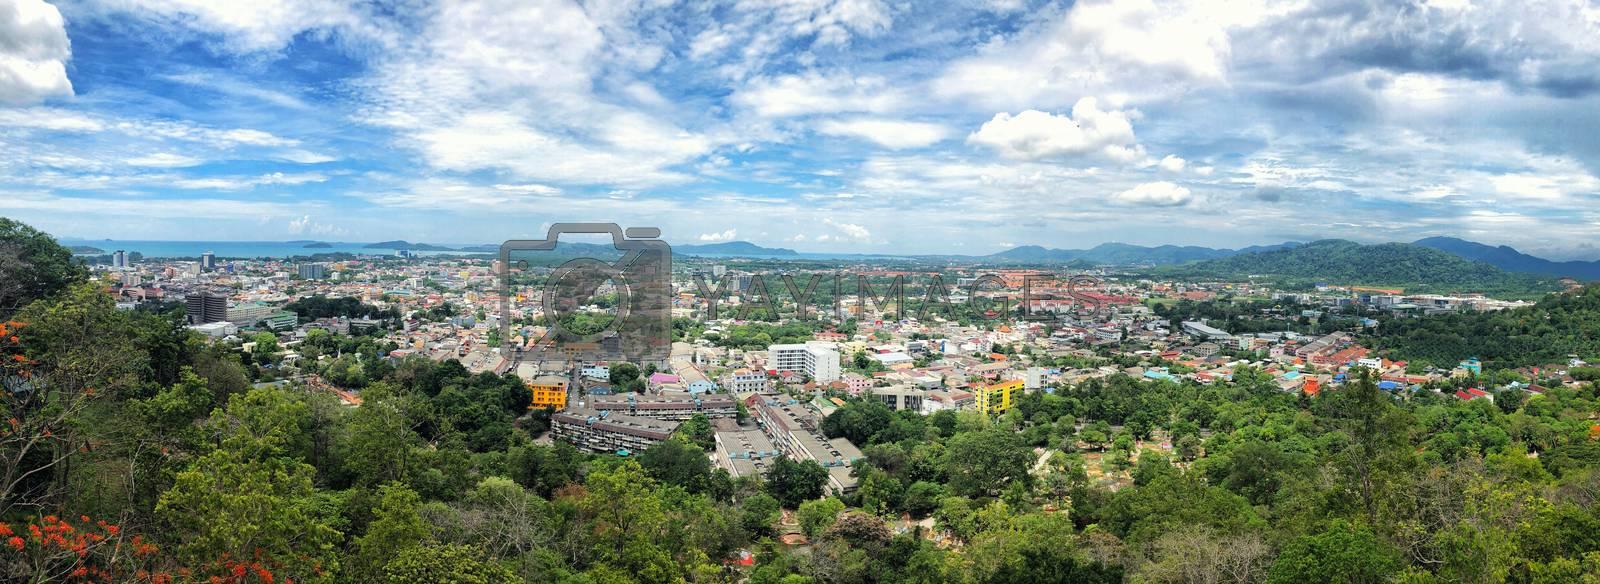 Panoramic view landscape at Khao Rang Viewpoint of Phuket city in daylight, Phuket province, Thailand